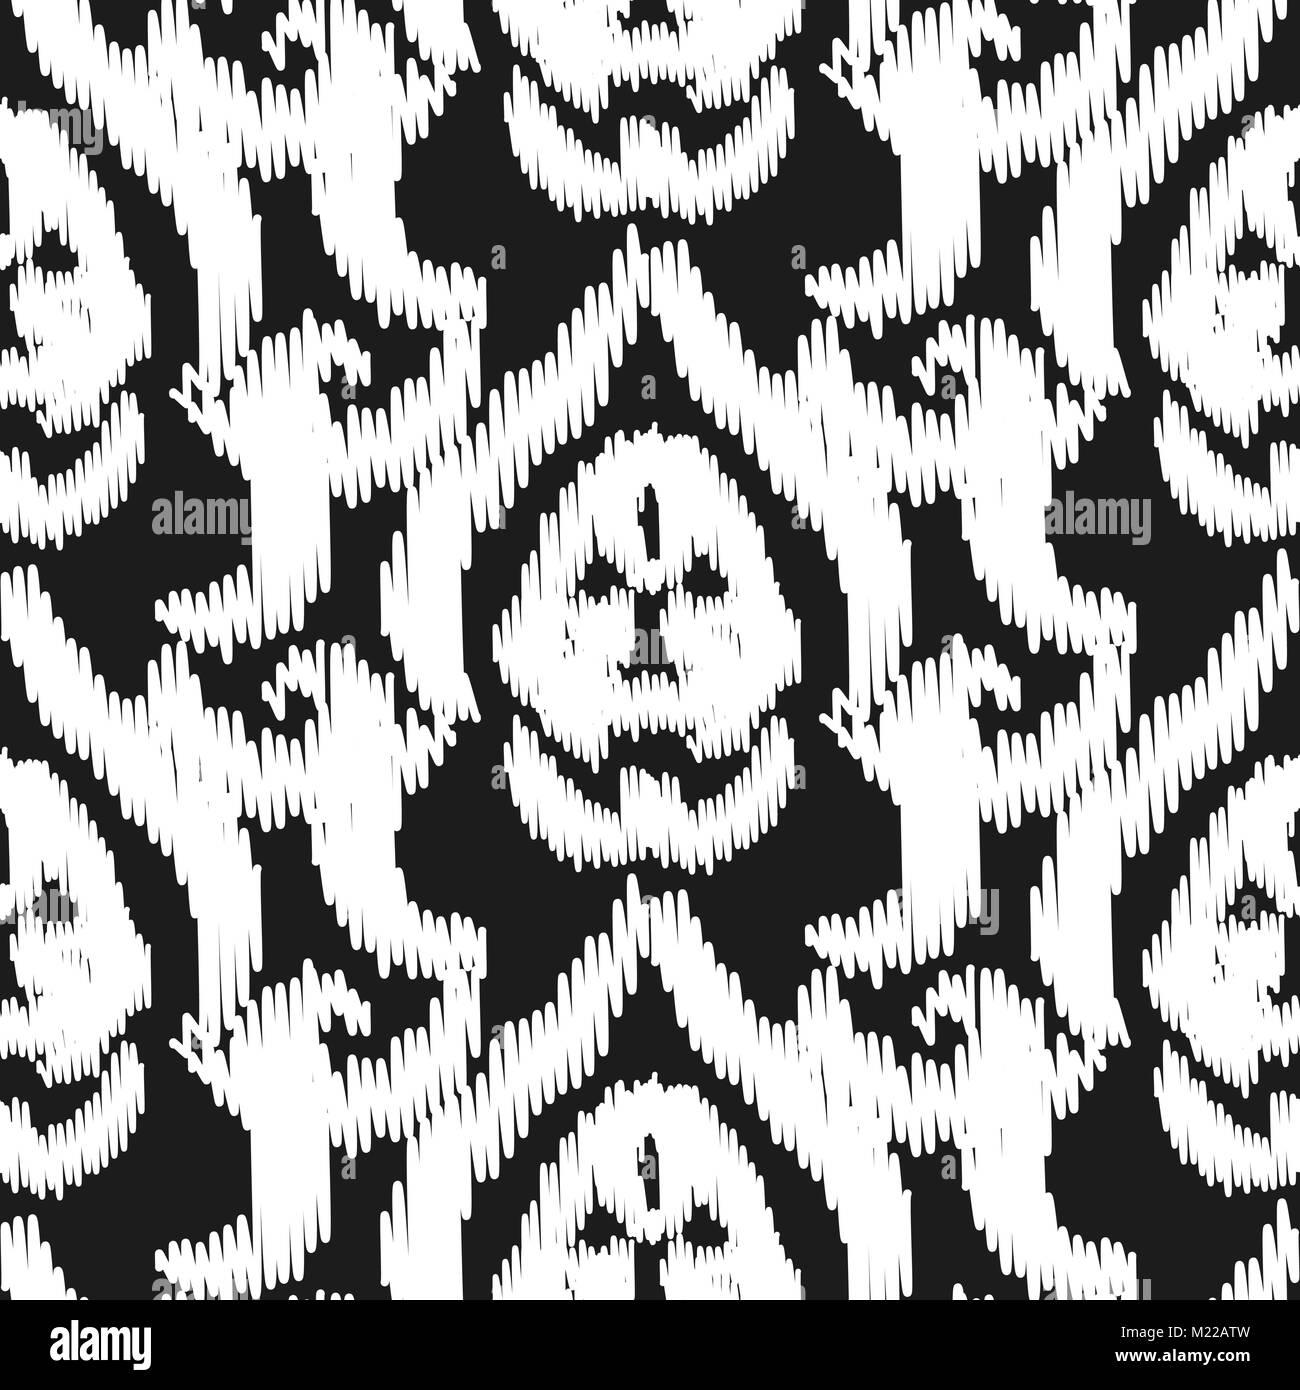 damast ikat nahtlose vektor tapete muster classic luxury style schwarz wei design - Tapete Schwarz Wei Muster